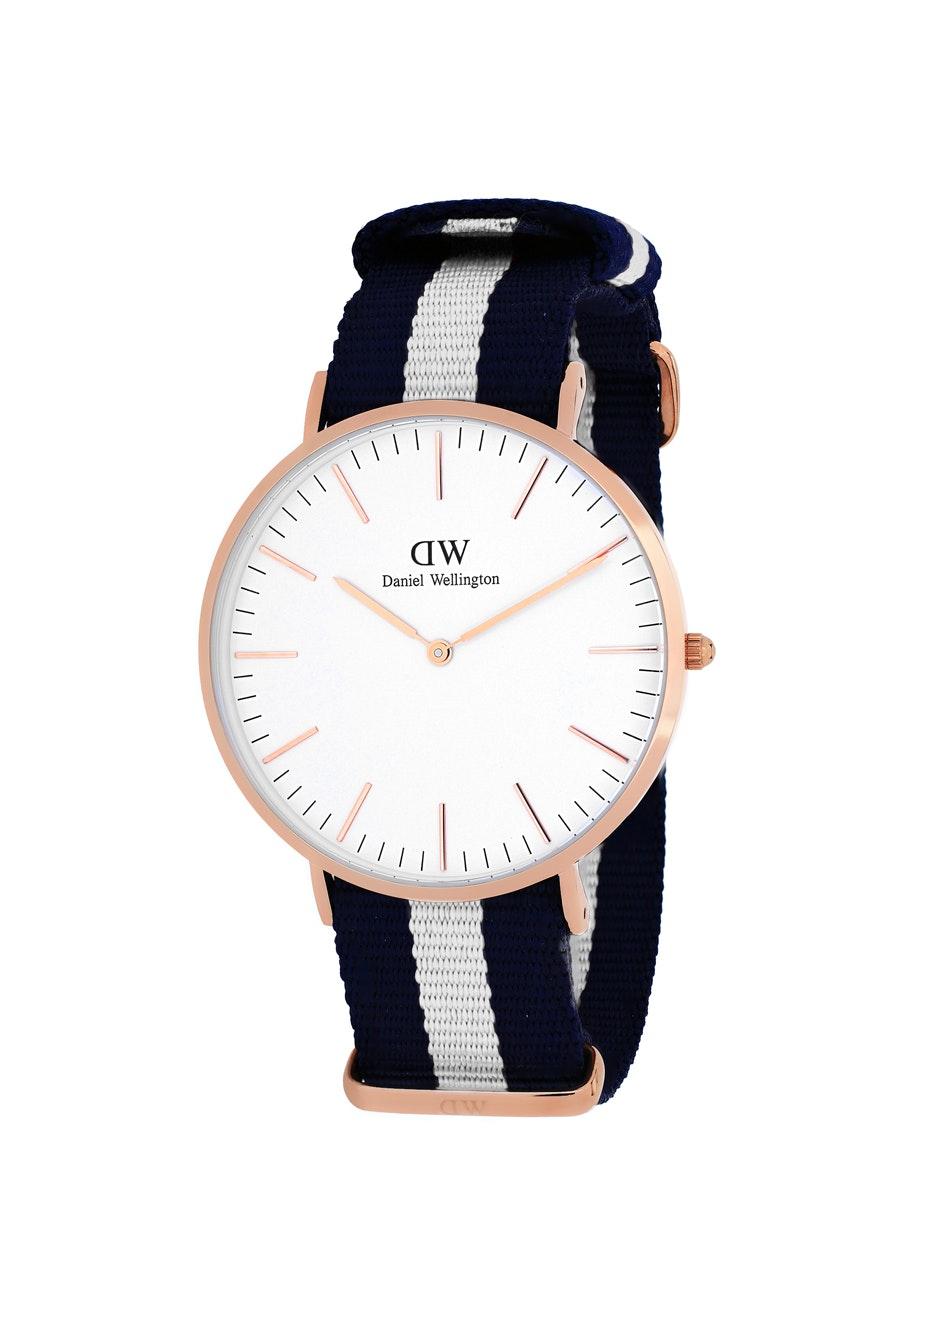 Daniel Wellington Men's Classic Glasgow - White/Two-tone Navy B